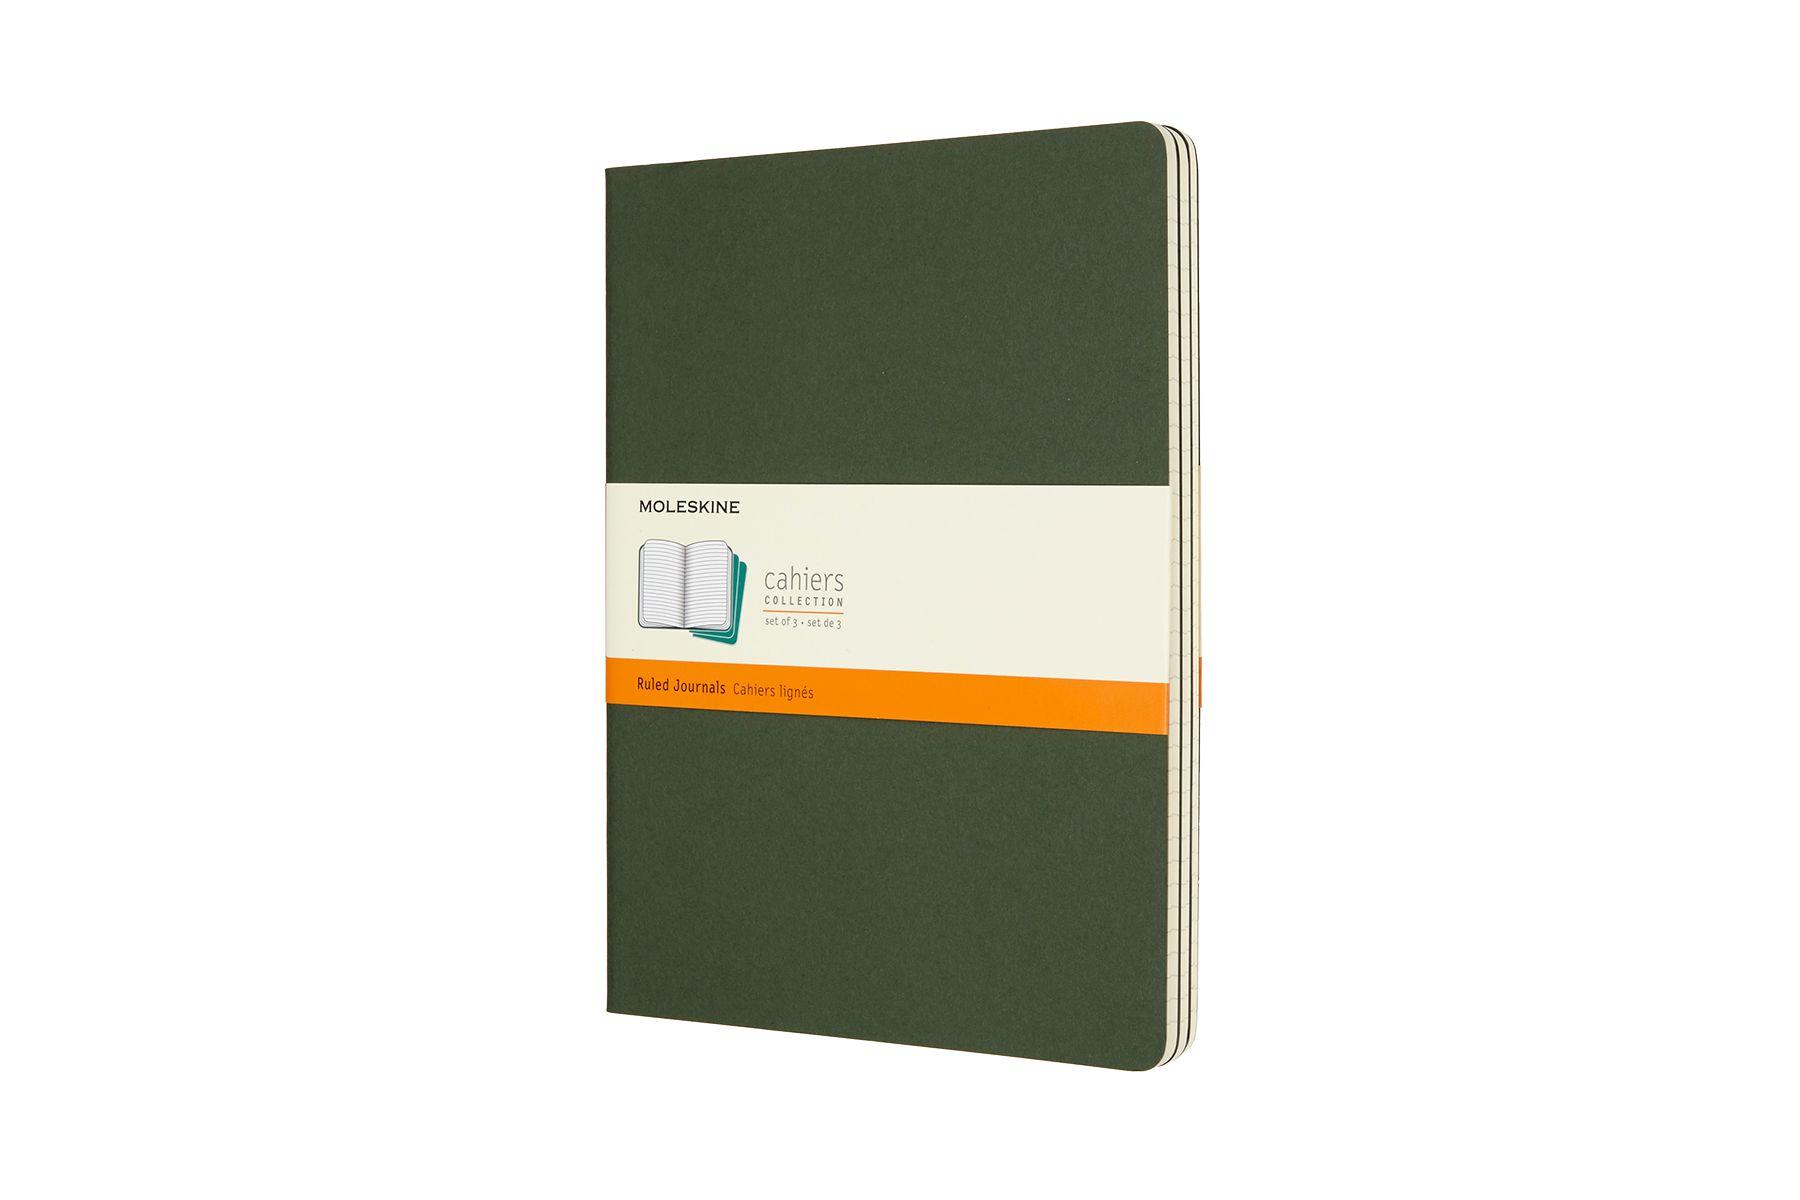 Moleskine Cahier Ruled Notebook XL Myrtle Green